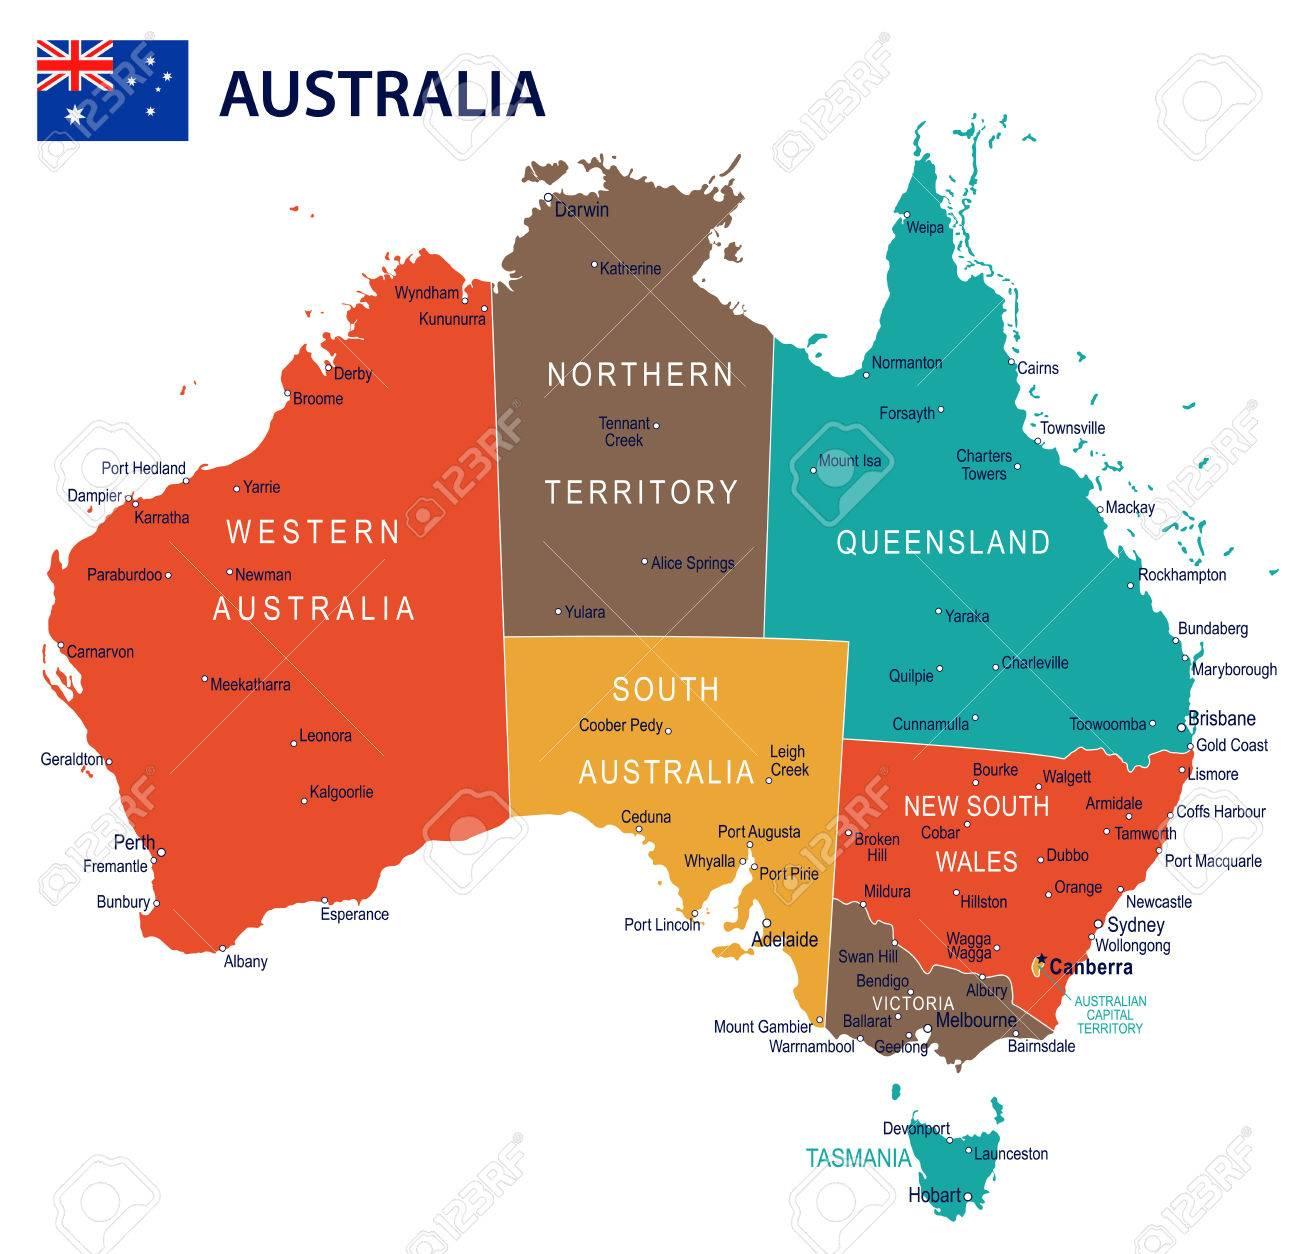 Australia Map Dubbo.Australia Map And Flag Highly Detailed Illustration Royalty Free